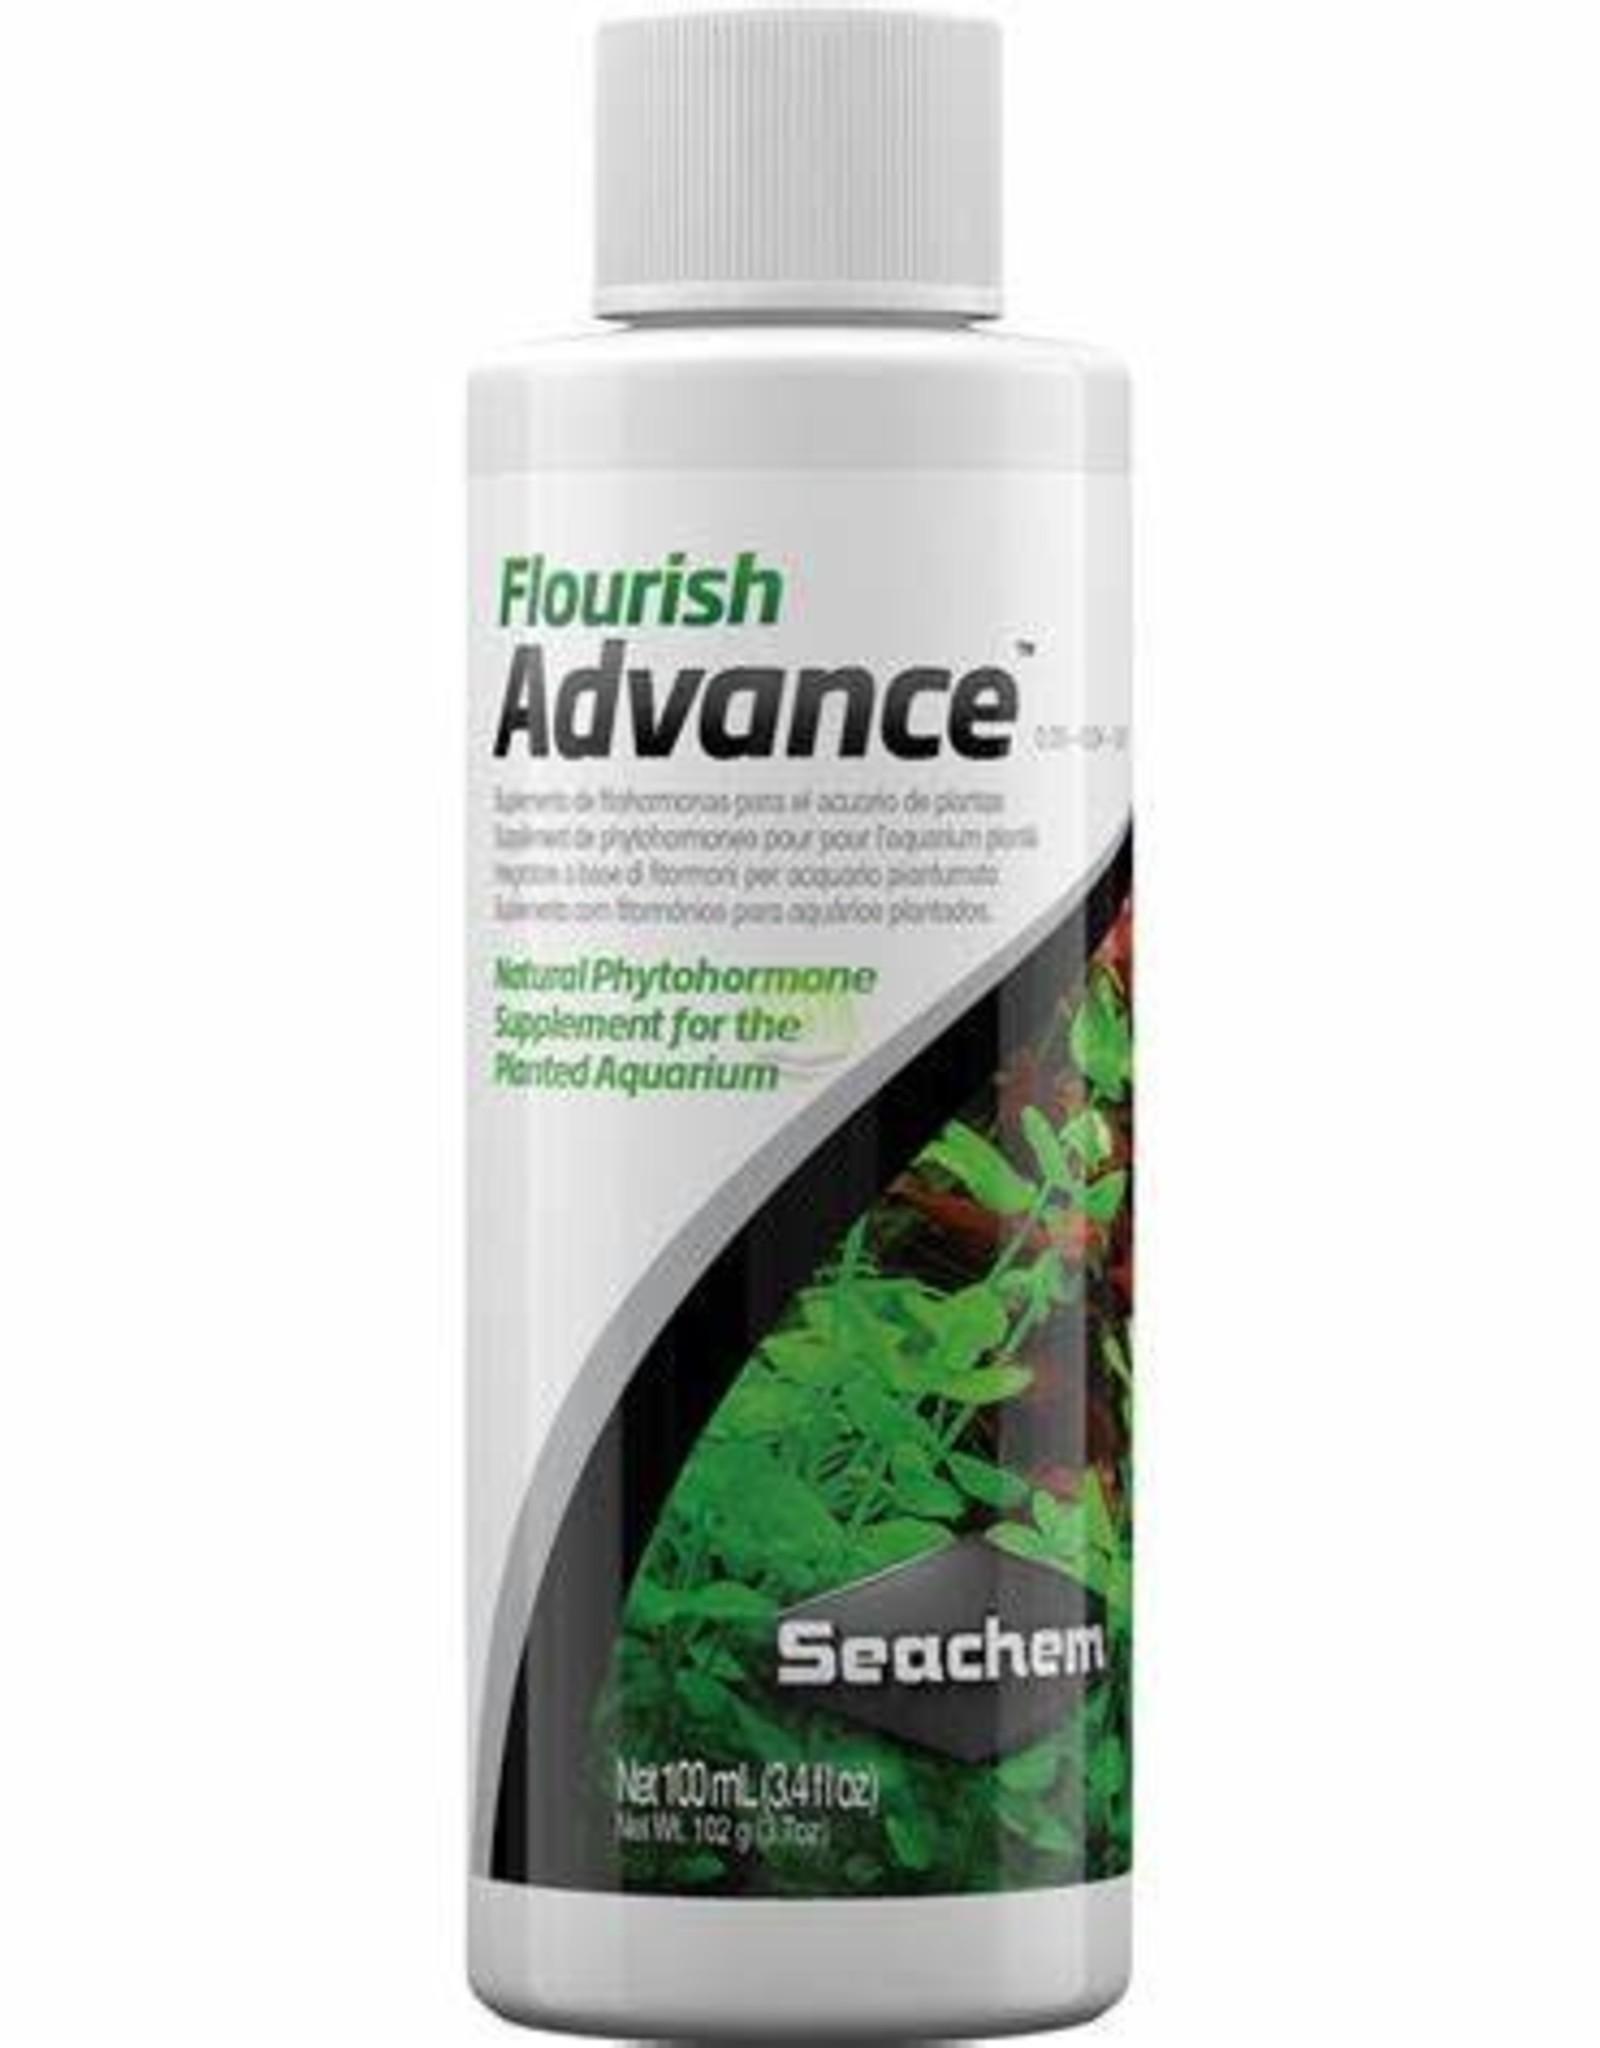 SEACHEM LABORATORIES FLOURISH ADVANCE 100ml